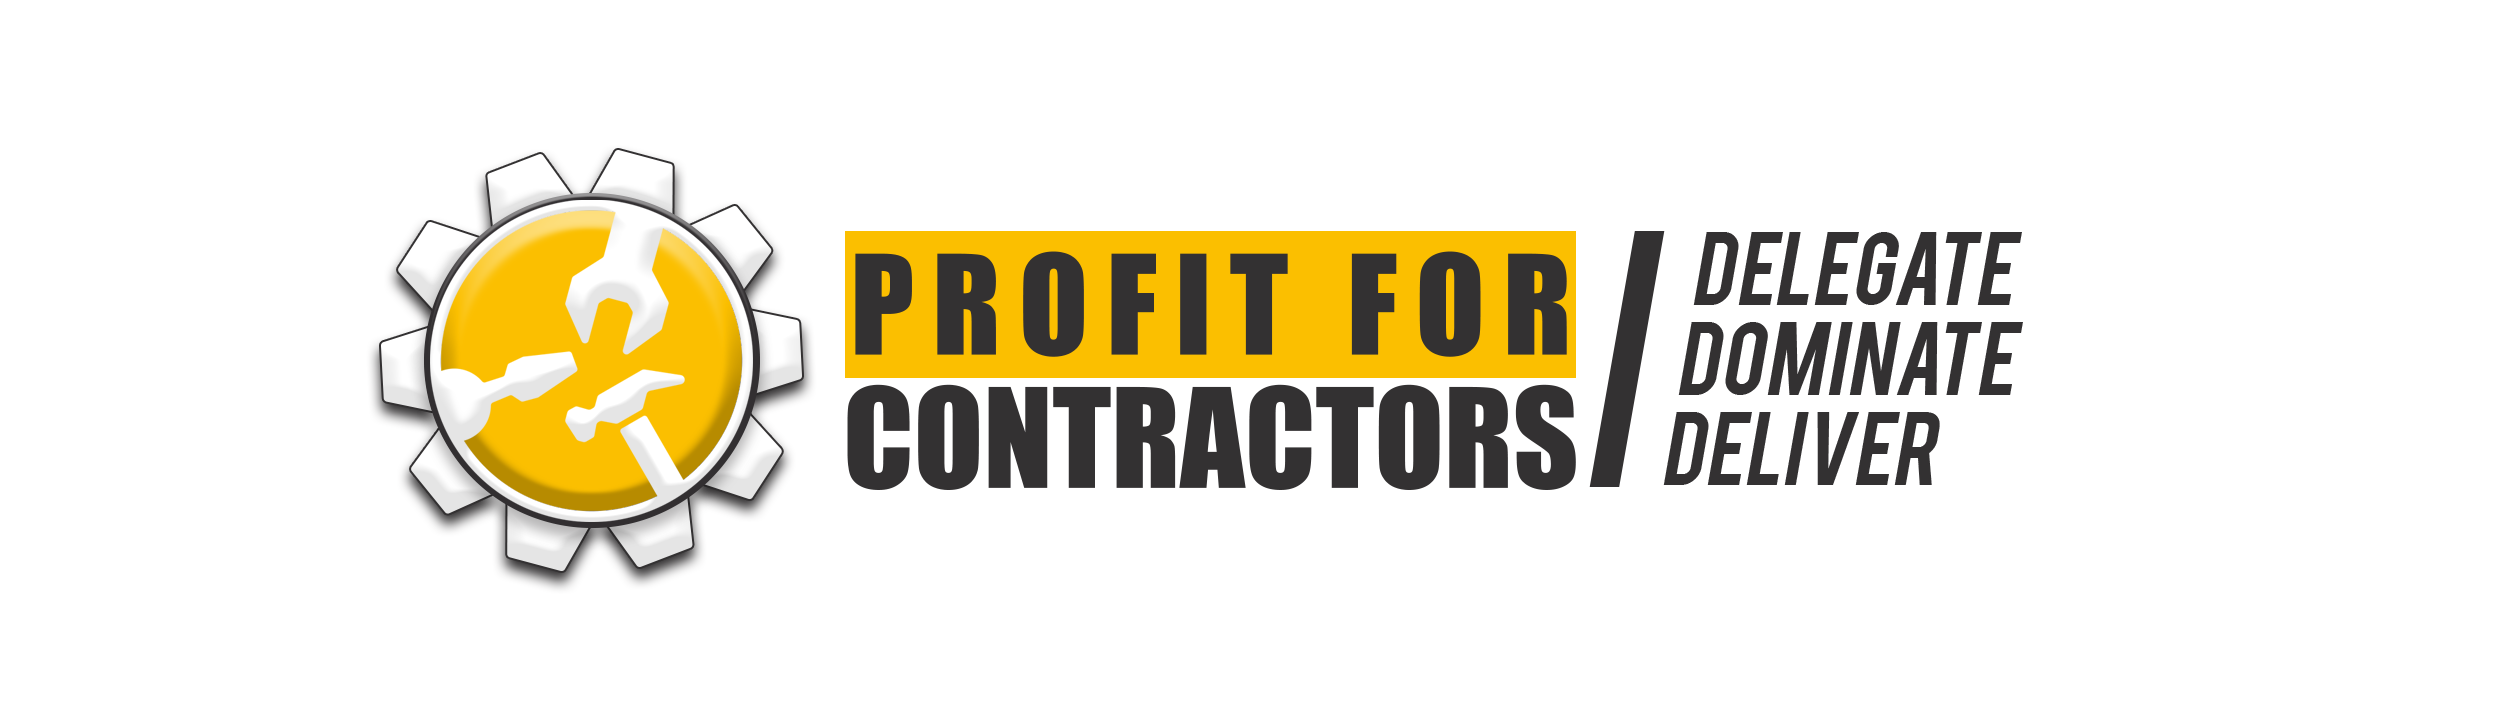 Profit For Contractors Website